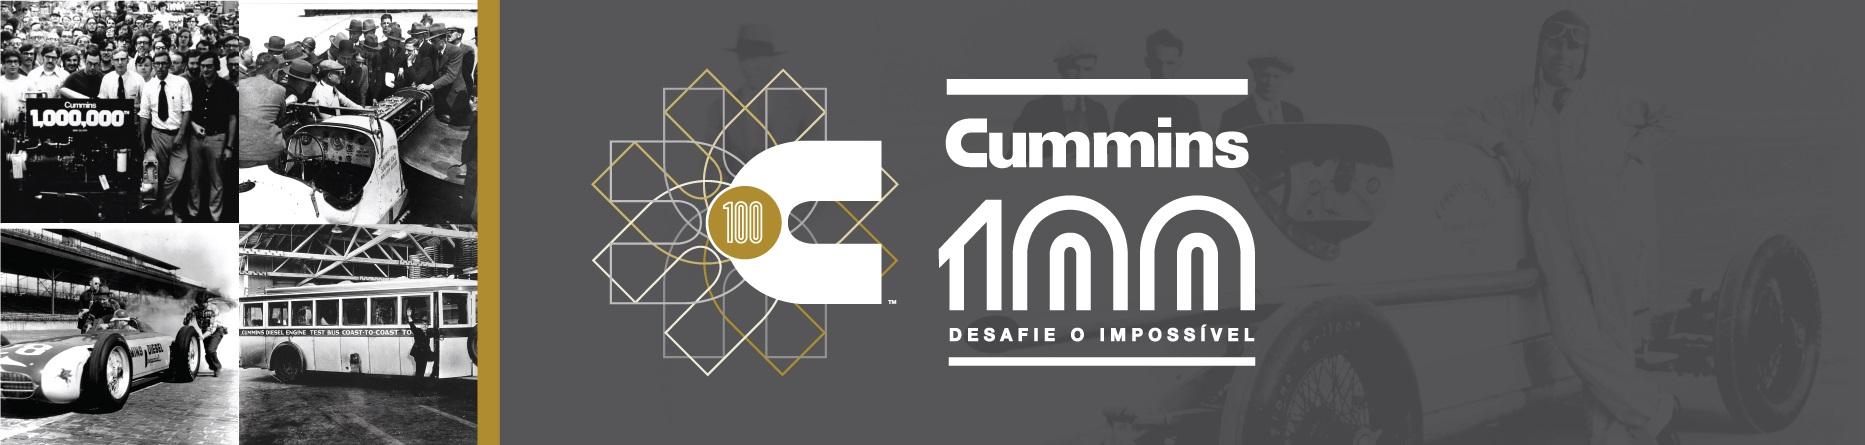 CUMMINS 100 ANOS